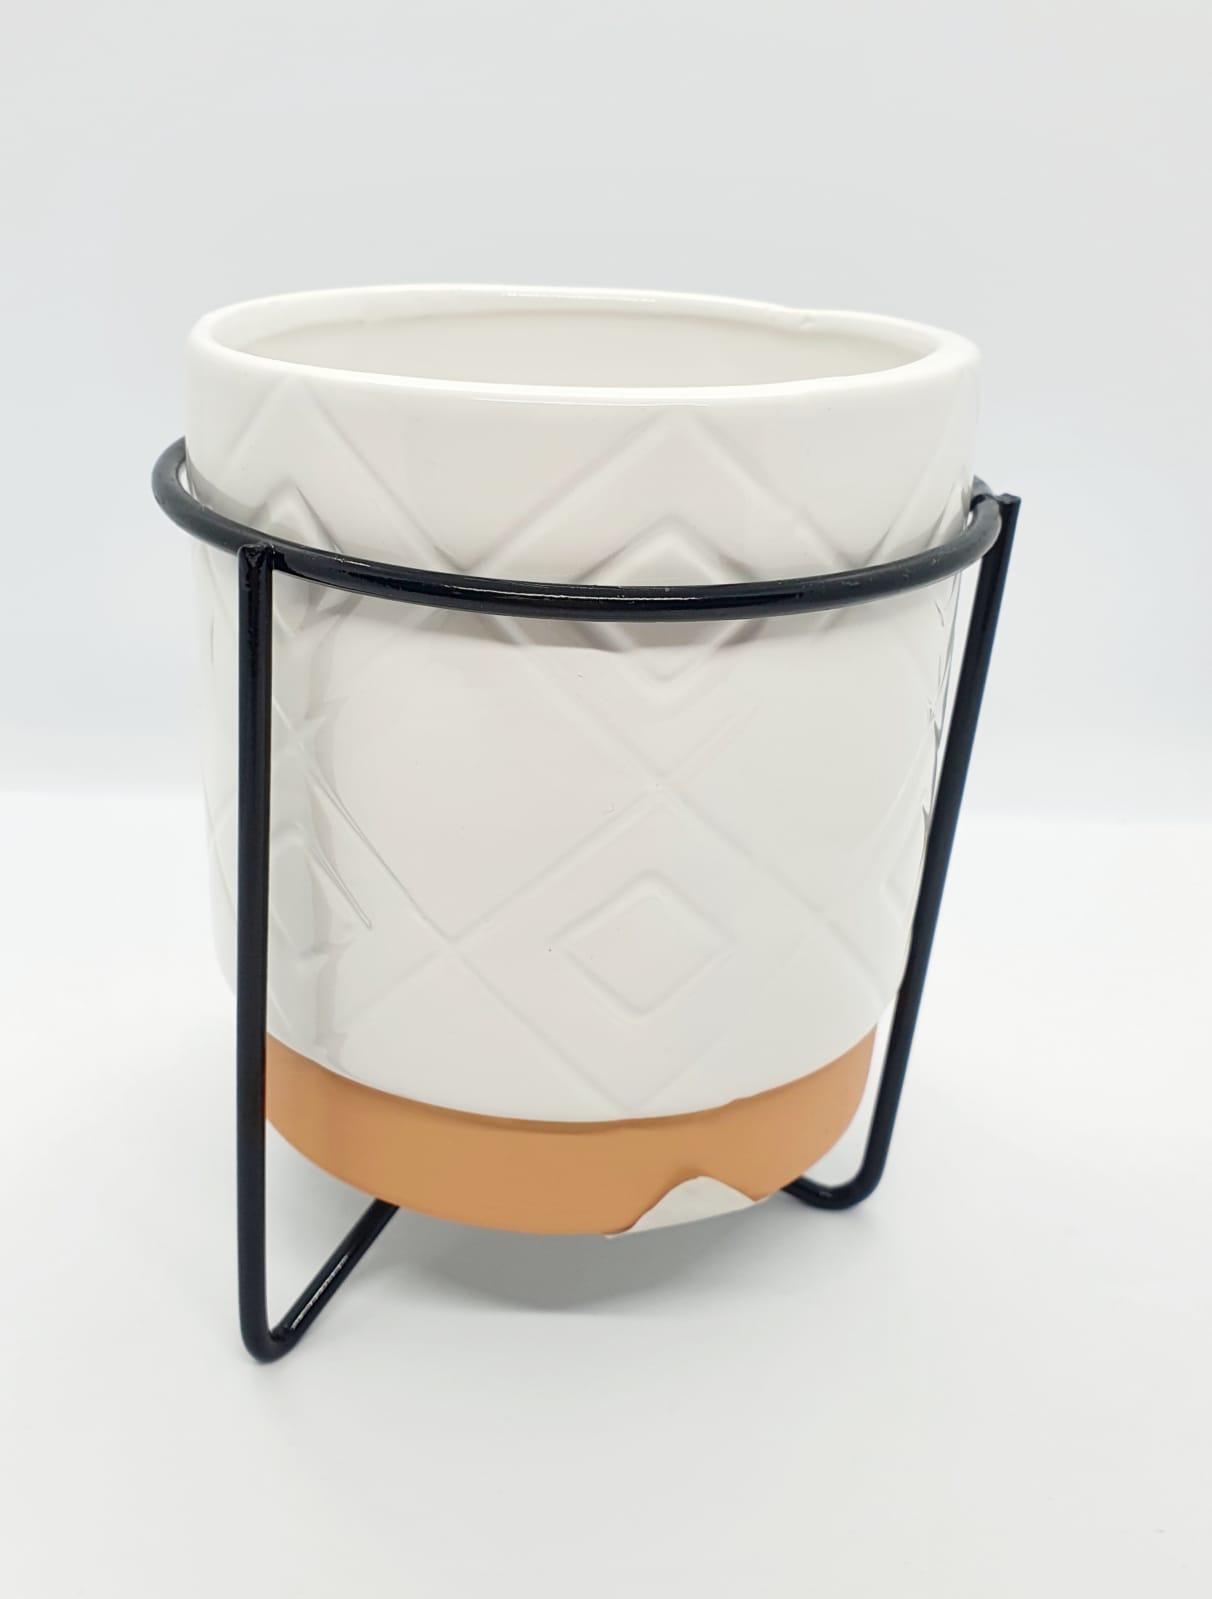 Vaso decorativo com suporte de metal preto médio- branco e coral